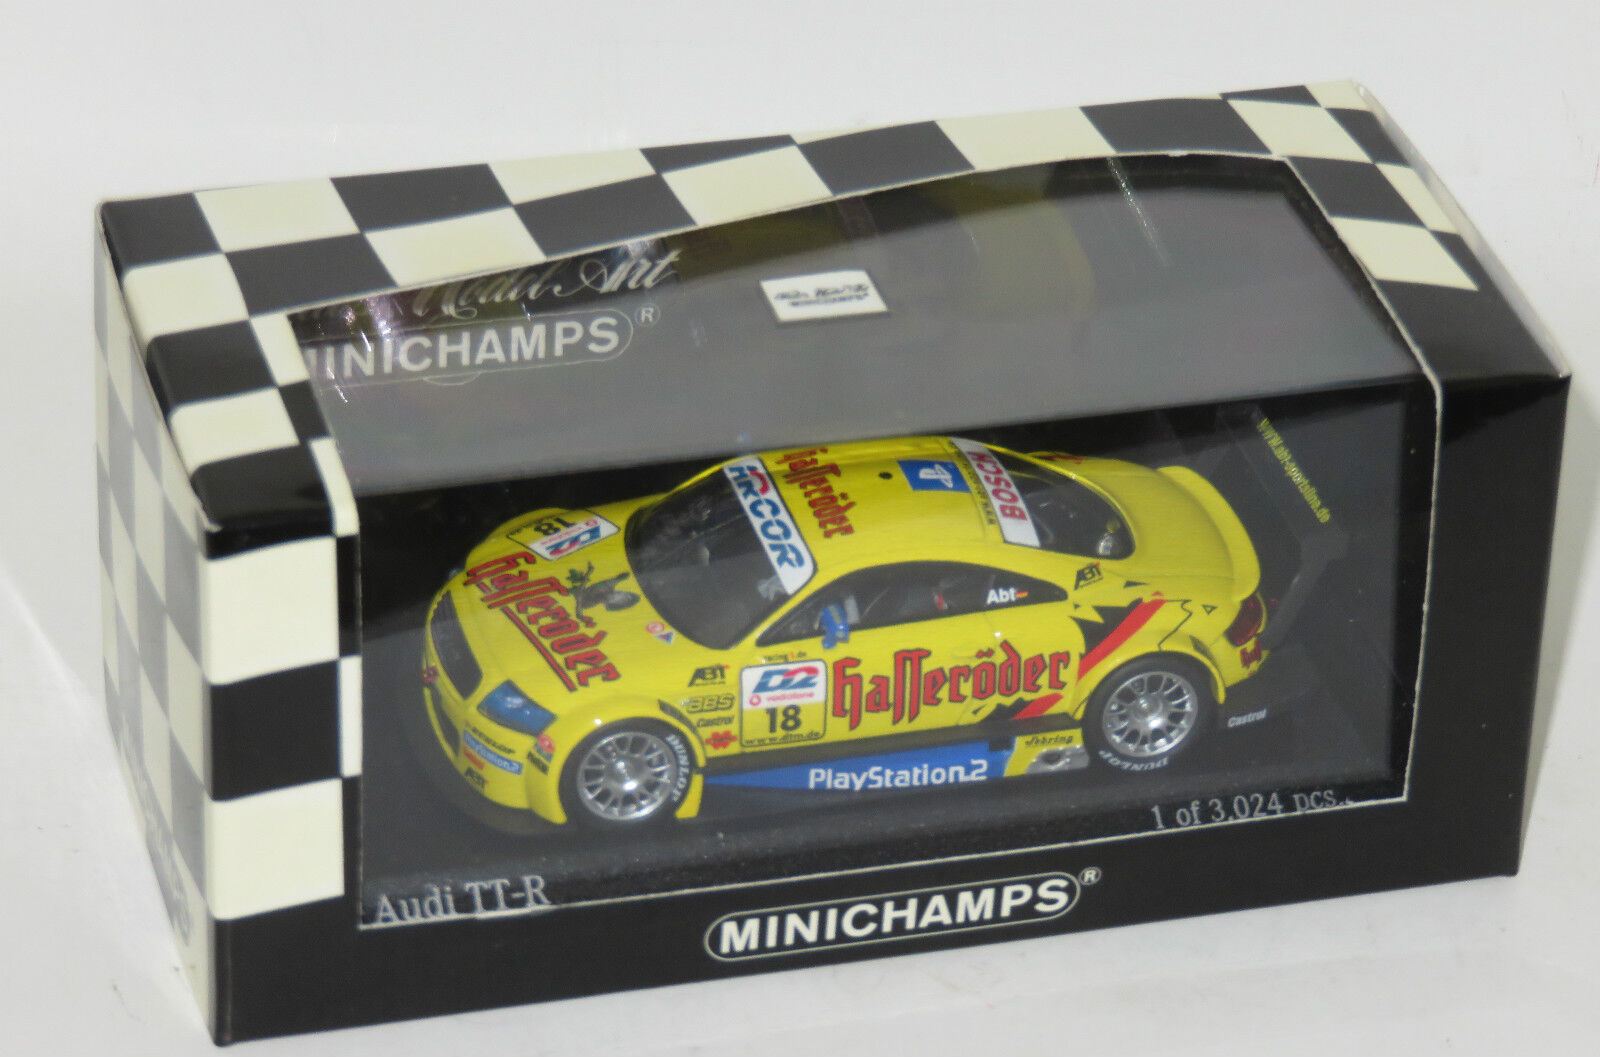 1 43 Hasseroder  Audi TT-R  Team Abt Sportsline  DTM 2001  C.Abt